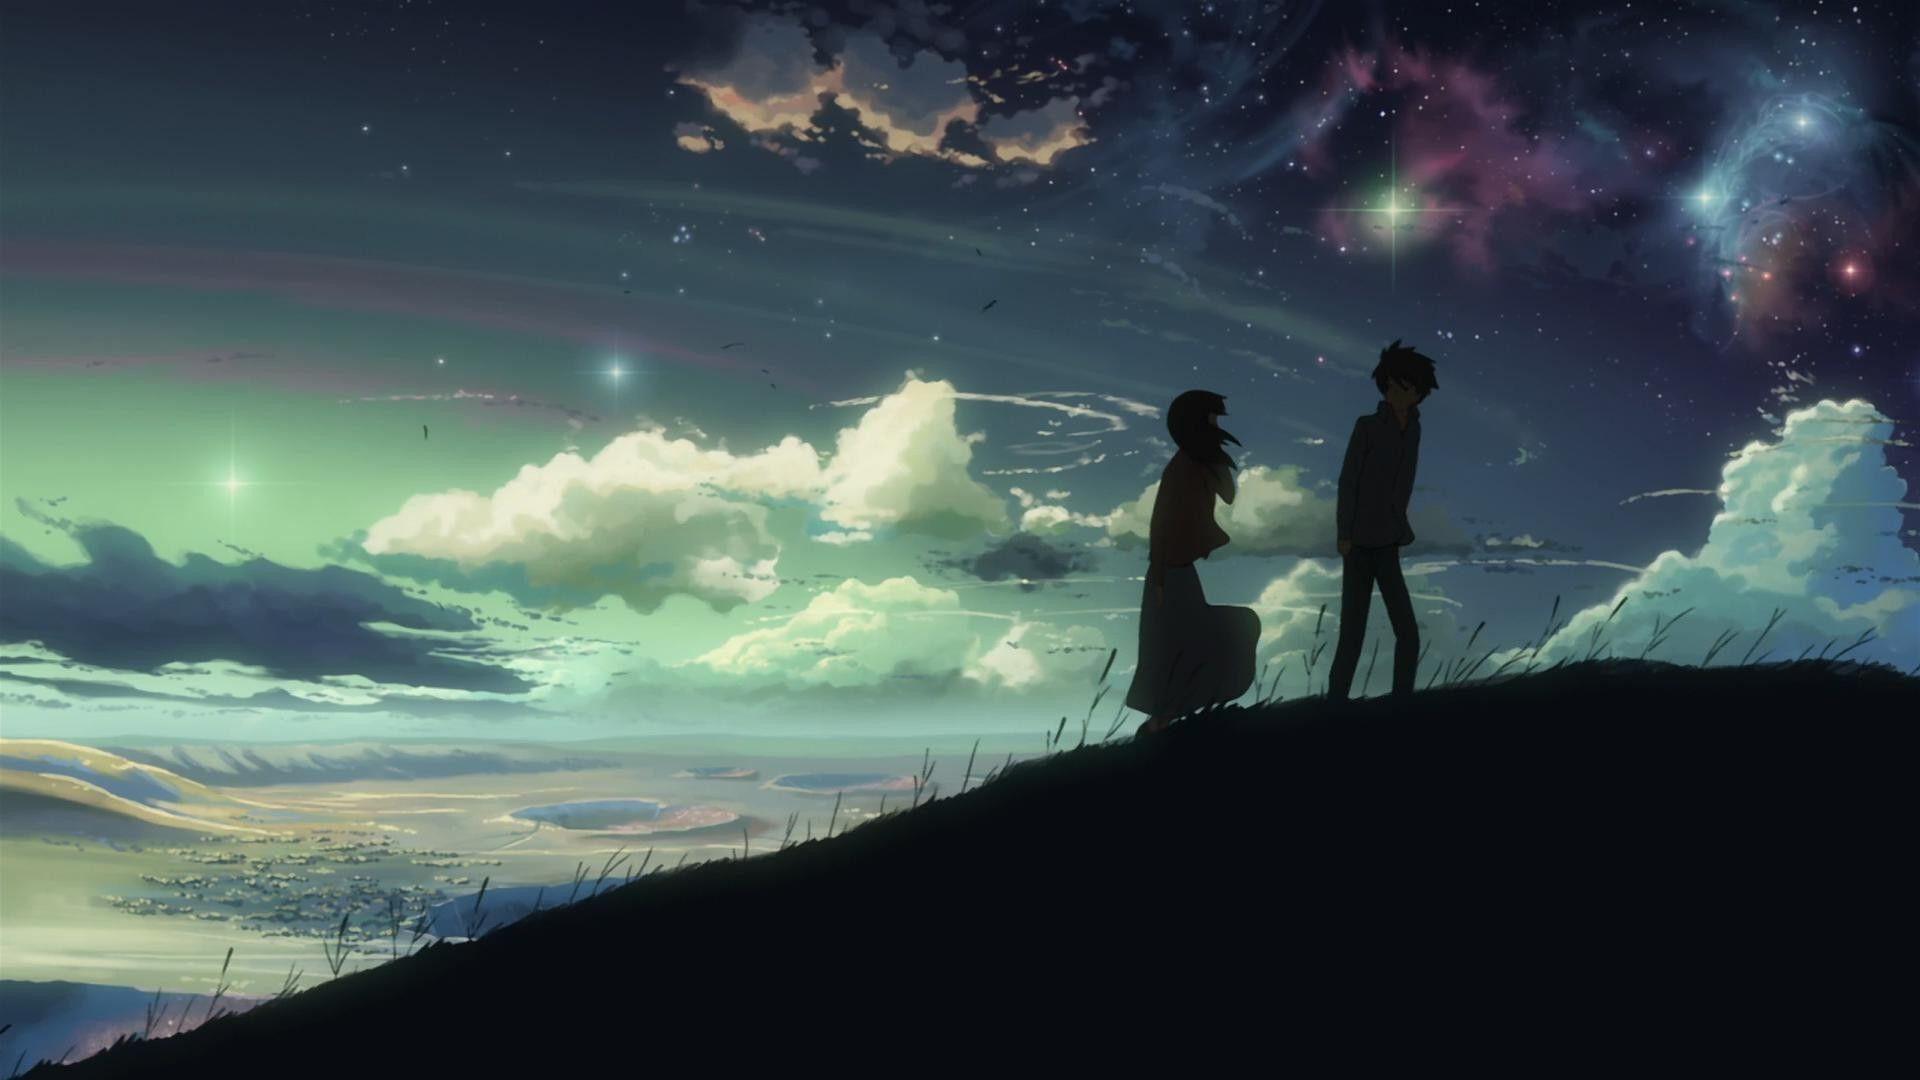 Res 1920x1080 Anime Wallpaper Dark Anime Scenery Wallpaper Wide With Hd Wide In 2020 Anime Scenery Anime Scenery Wallpaper Scenery Wallpaper